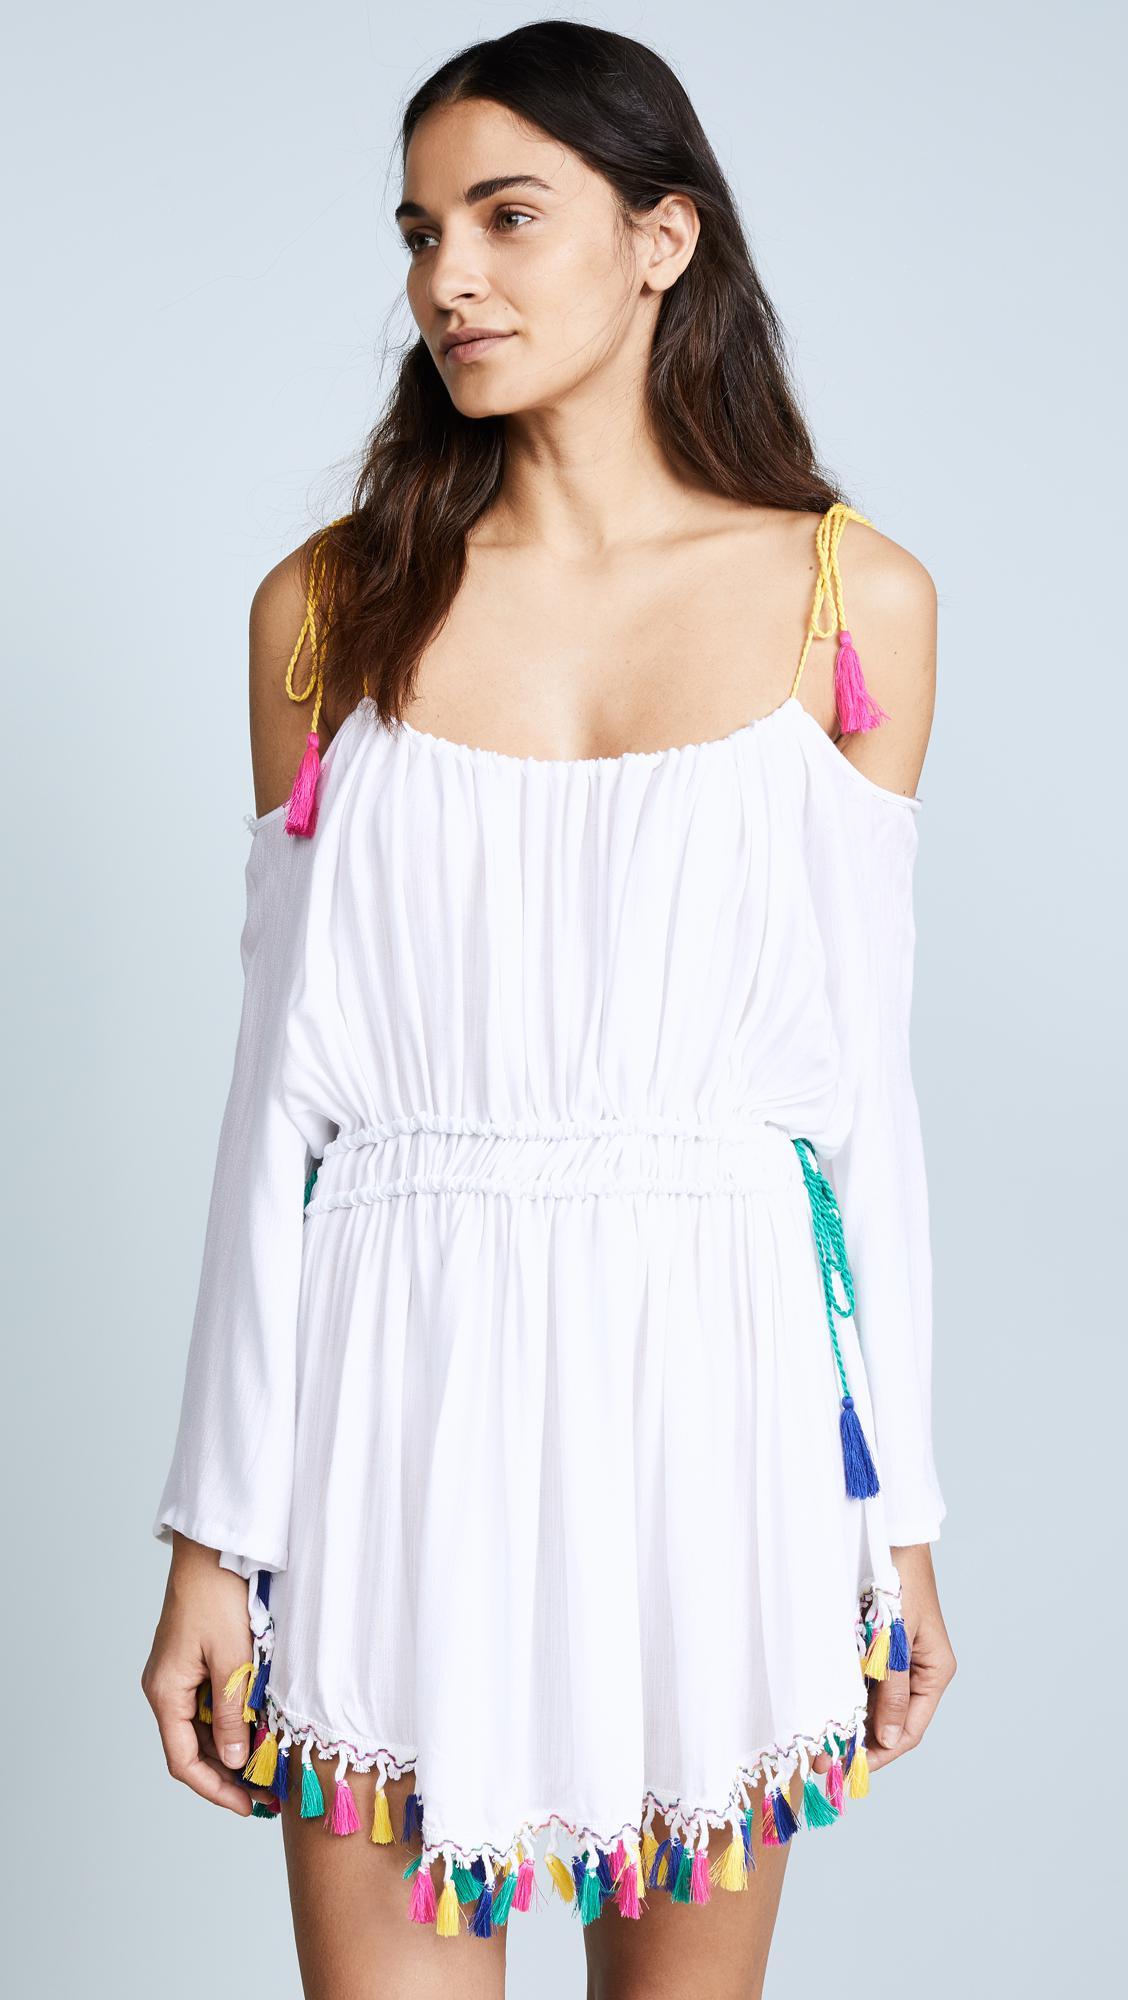 a2ba8ec5a5 Nanette Lepore Fiesta Cover Up Dress in White - Lyst